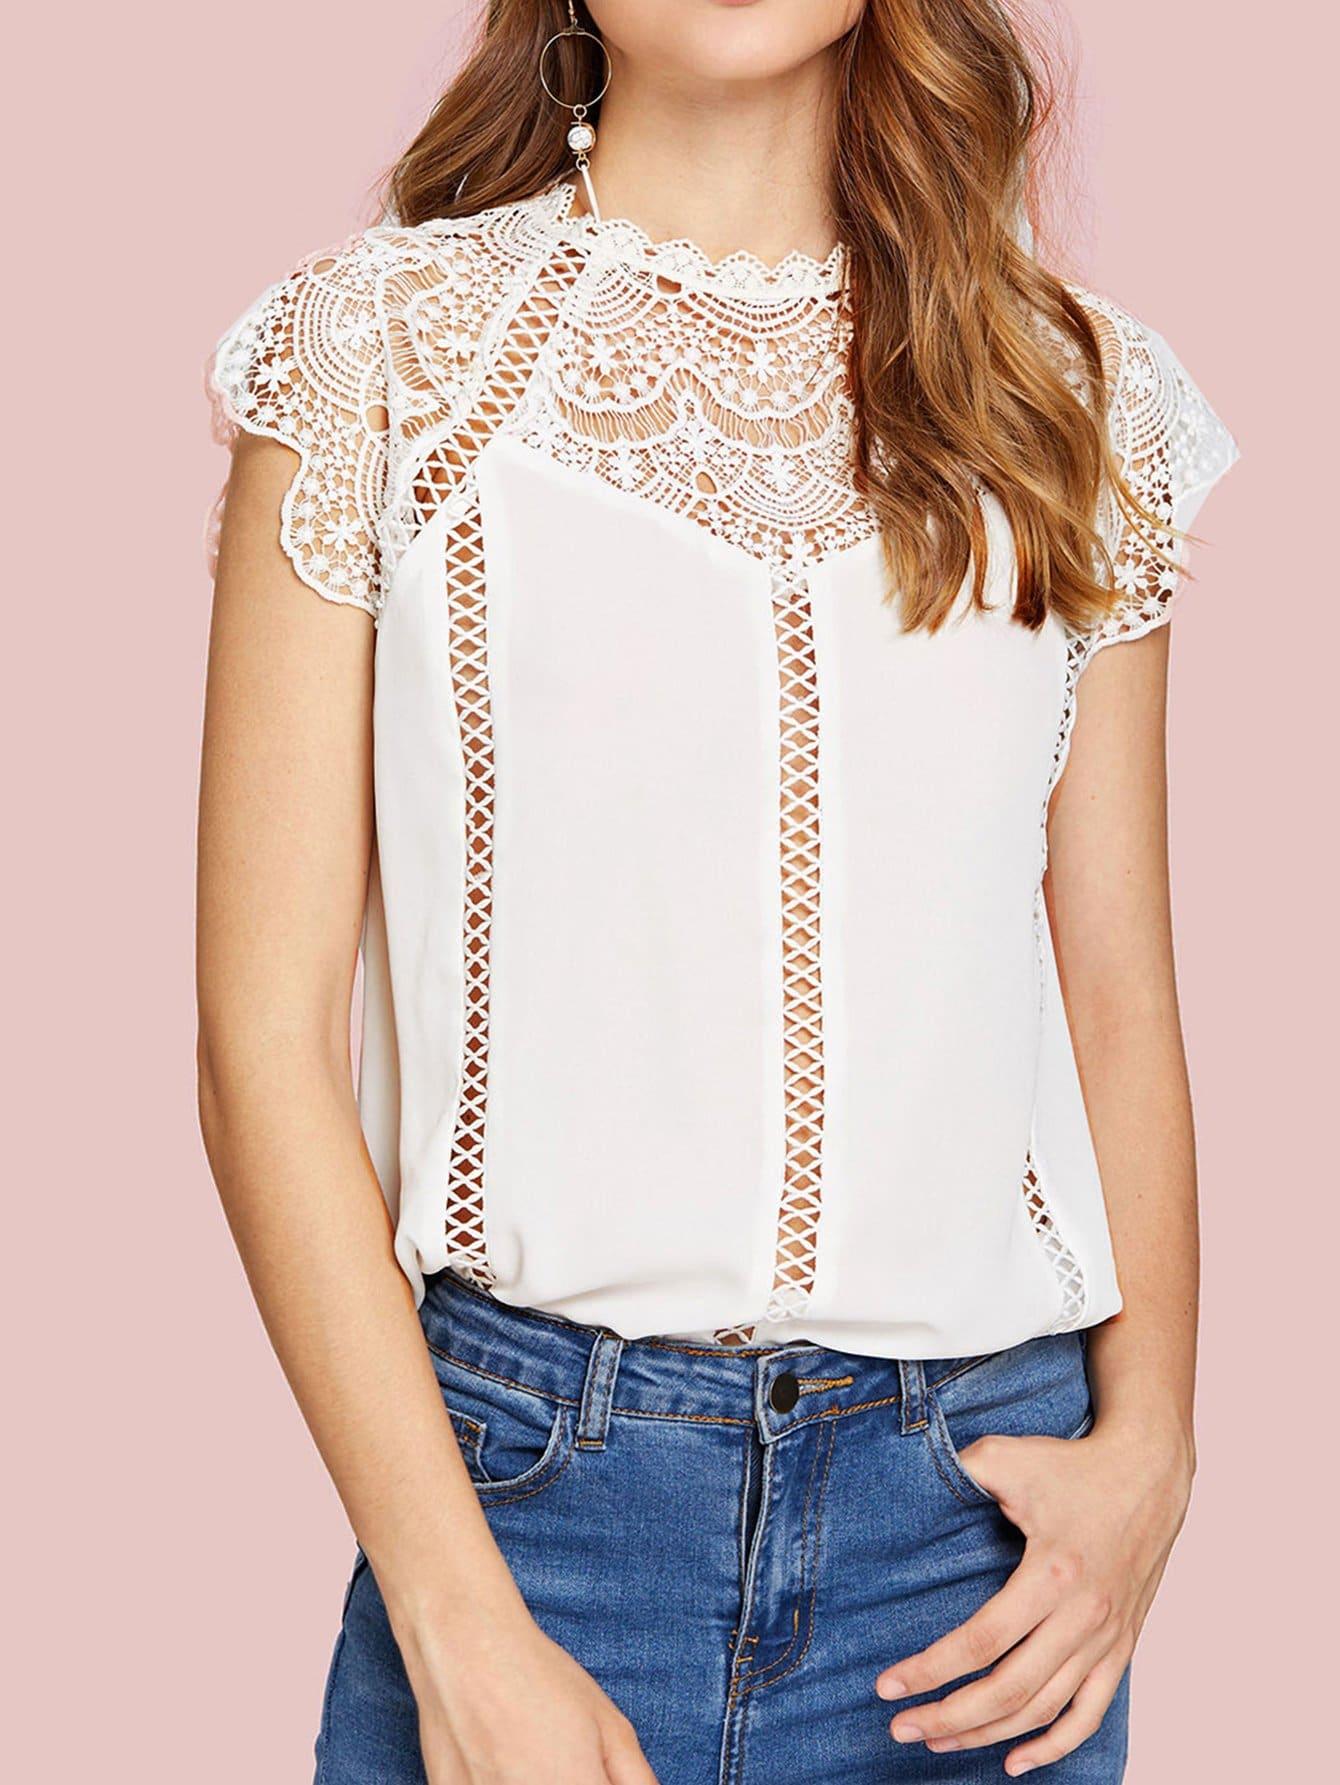 Sheer Lace Yoke Top frilled collar lace yoke sleeveless top